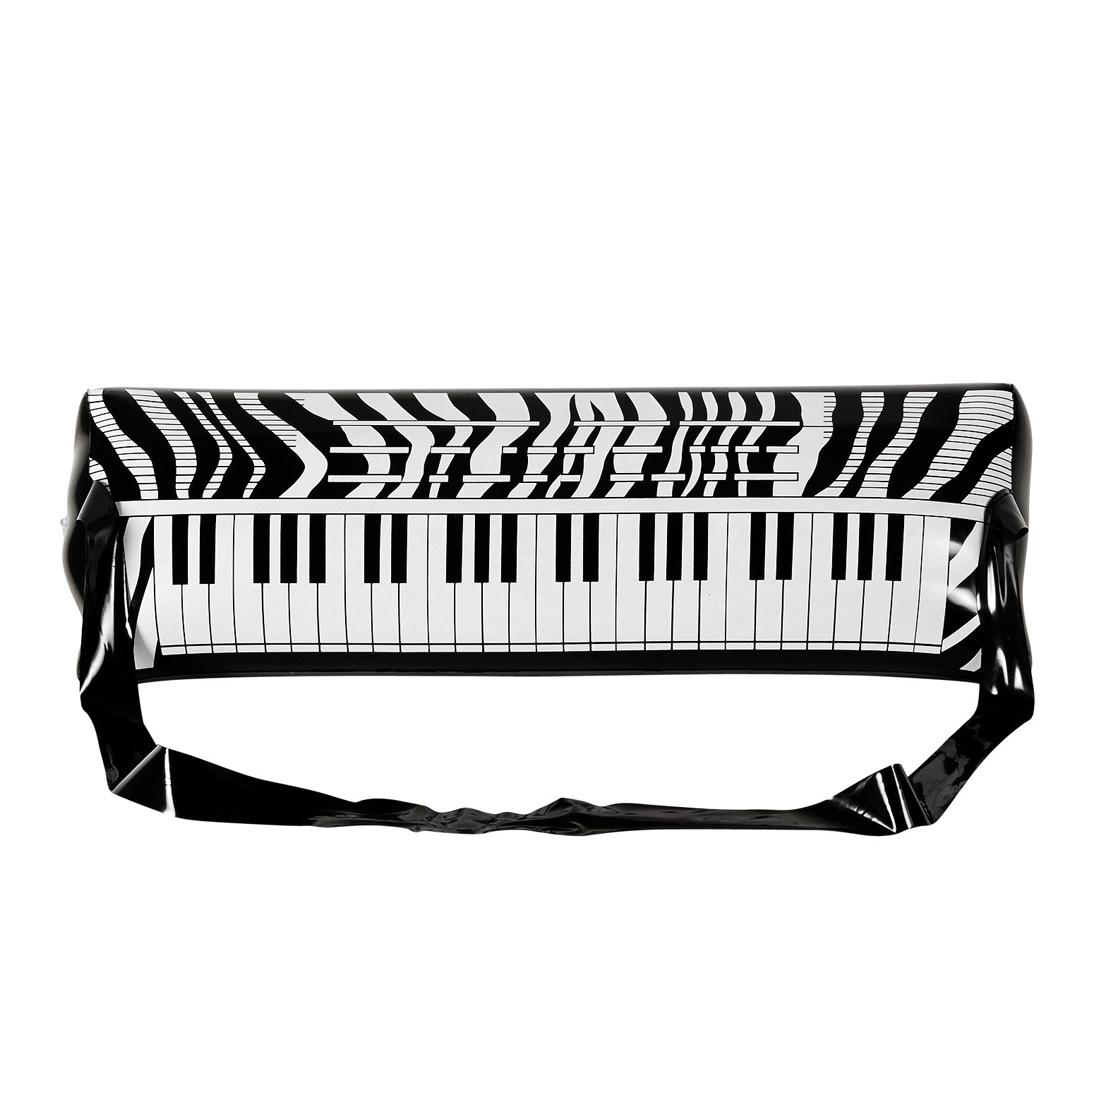 aufblasbares klavier keyboard rockstar luft piano. Black Bedroom Furniture Sets. Home Design Ideas